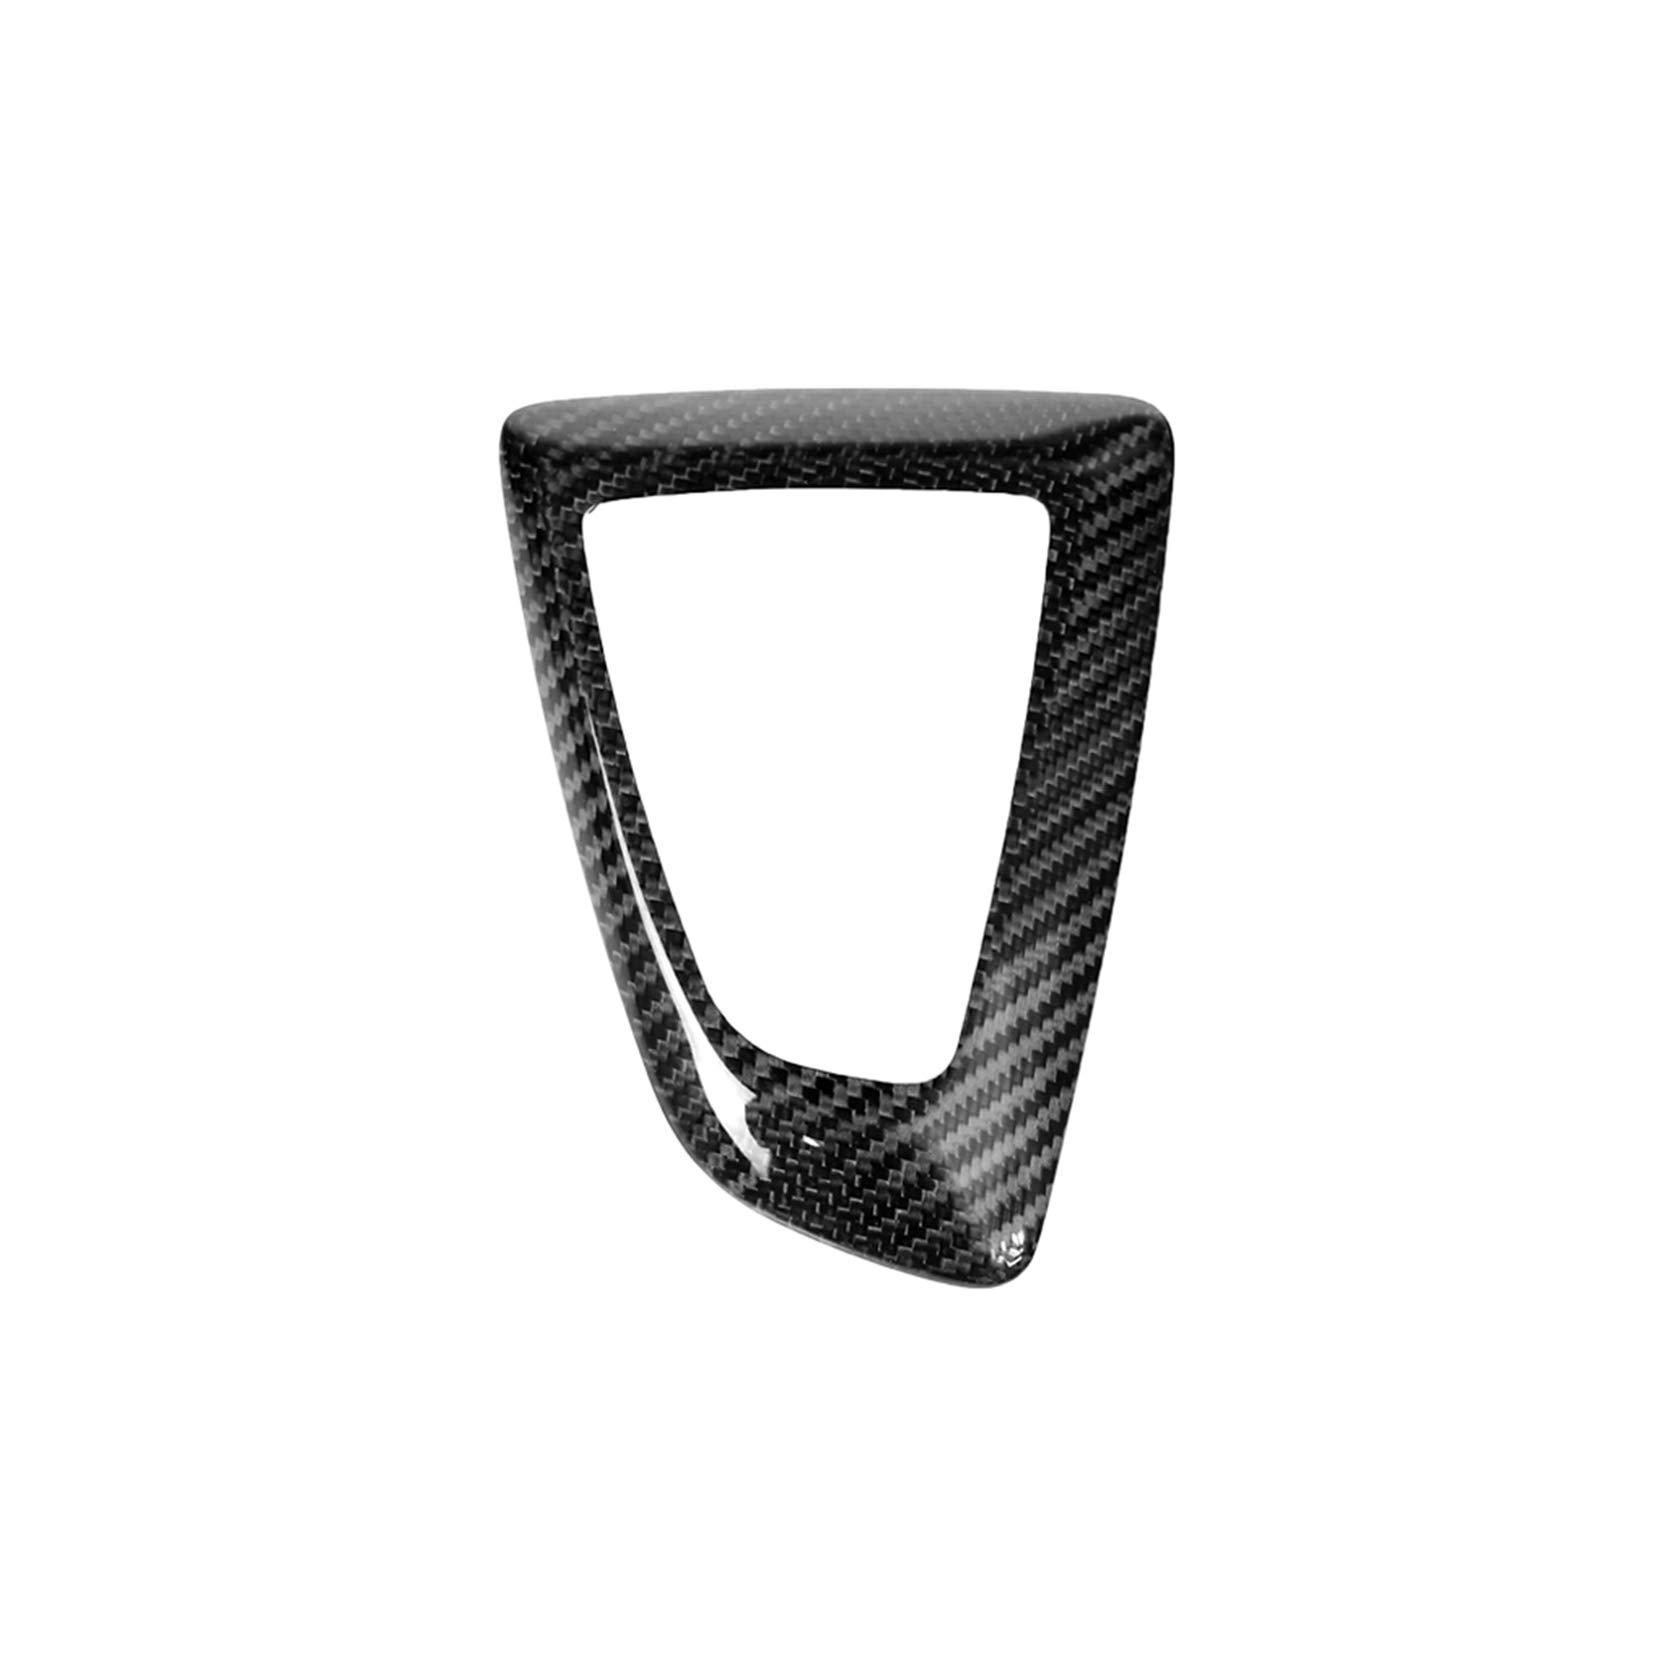 Carbon Fiber Dashboard Steering Wheel Panel Frame Decal Cover Trim for BMW 3 Series 4th E46 320i 325i 330i 335i 340i M3 1998-2006